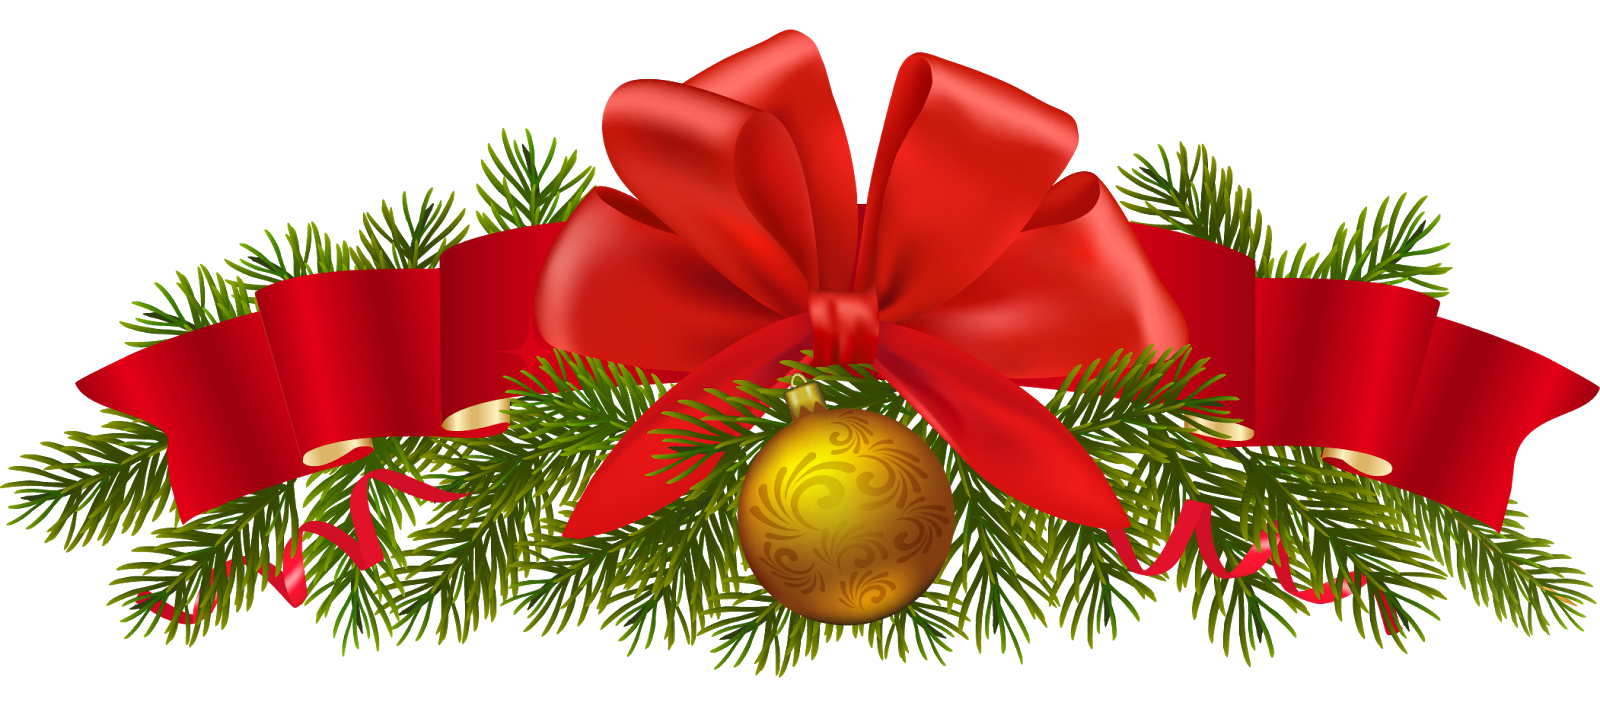 Christmas%2BImages%2B37.jpg